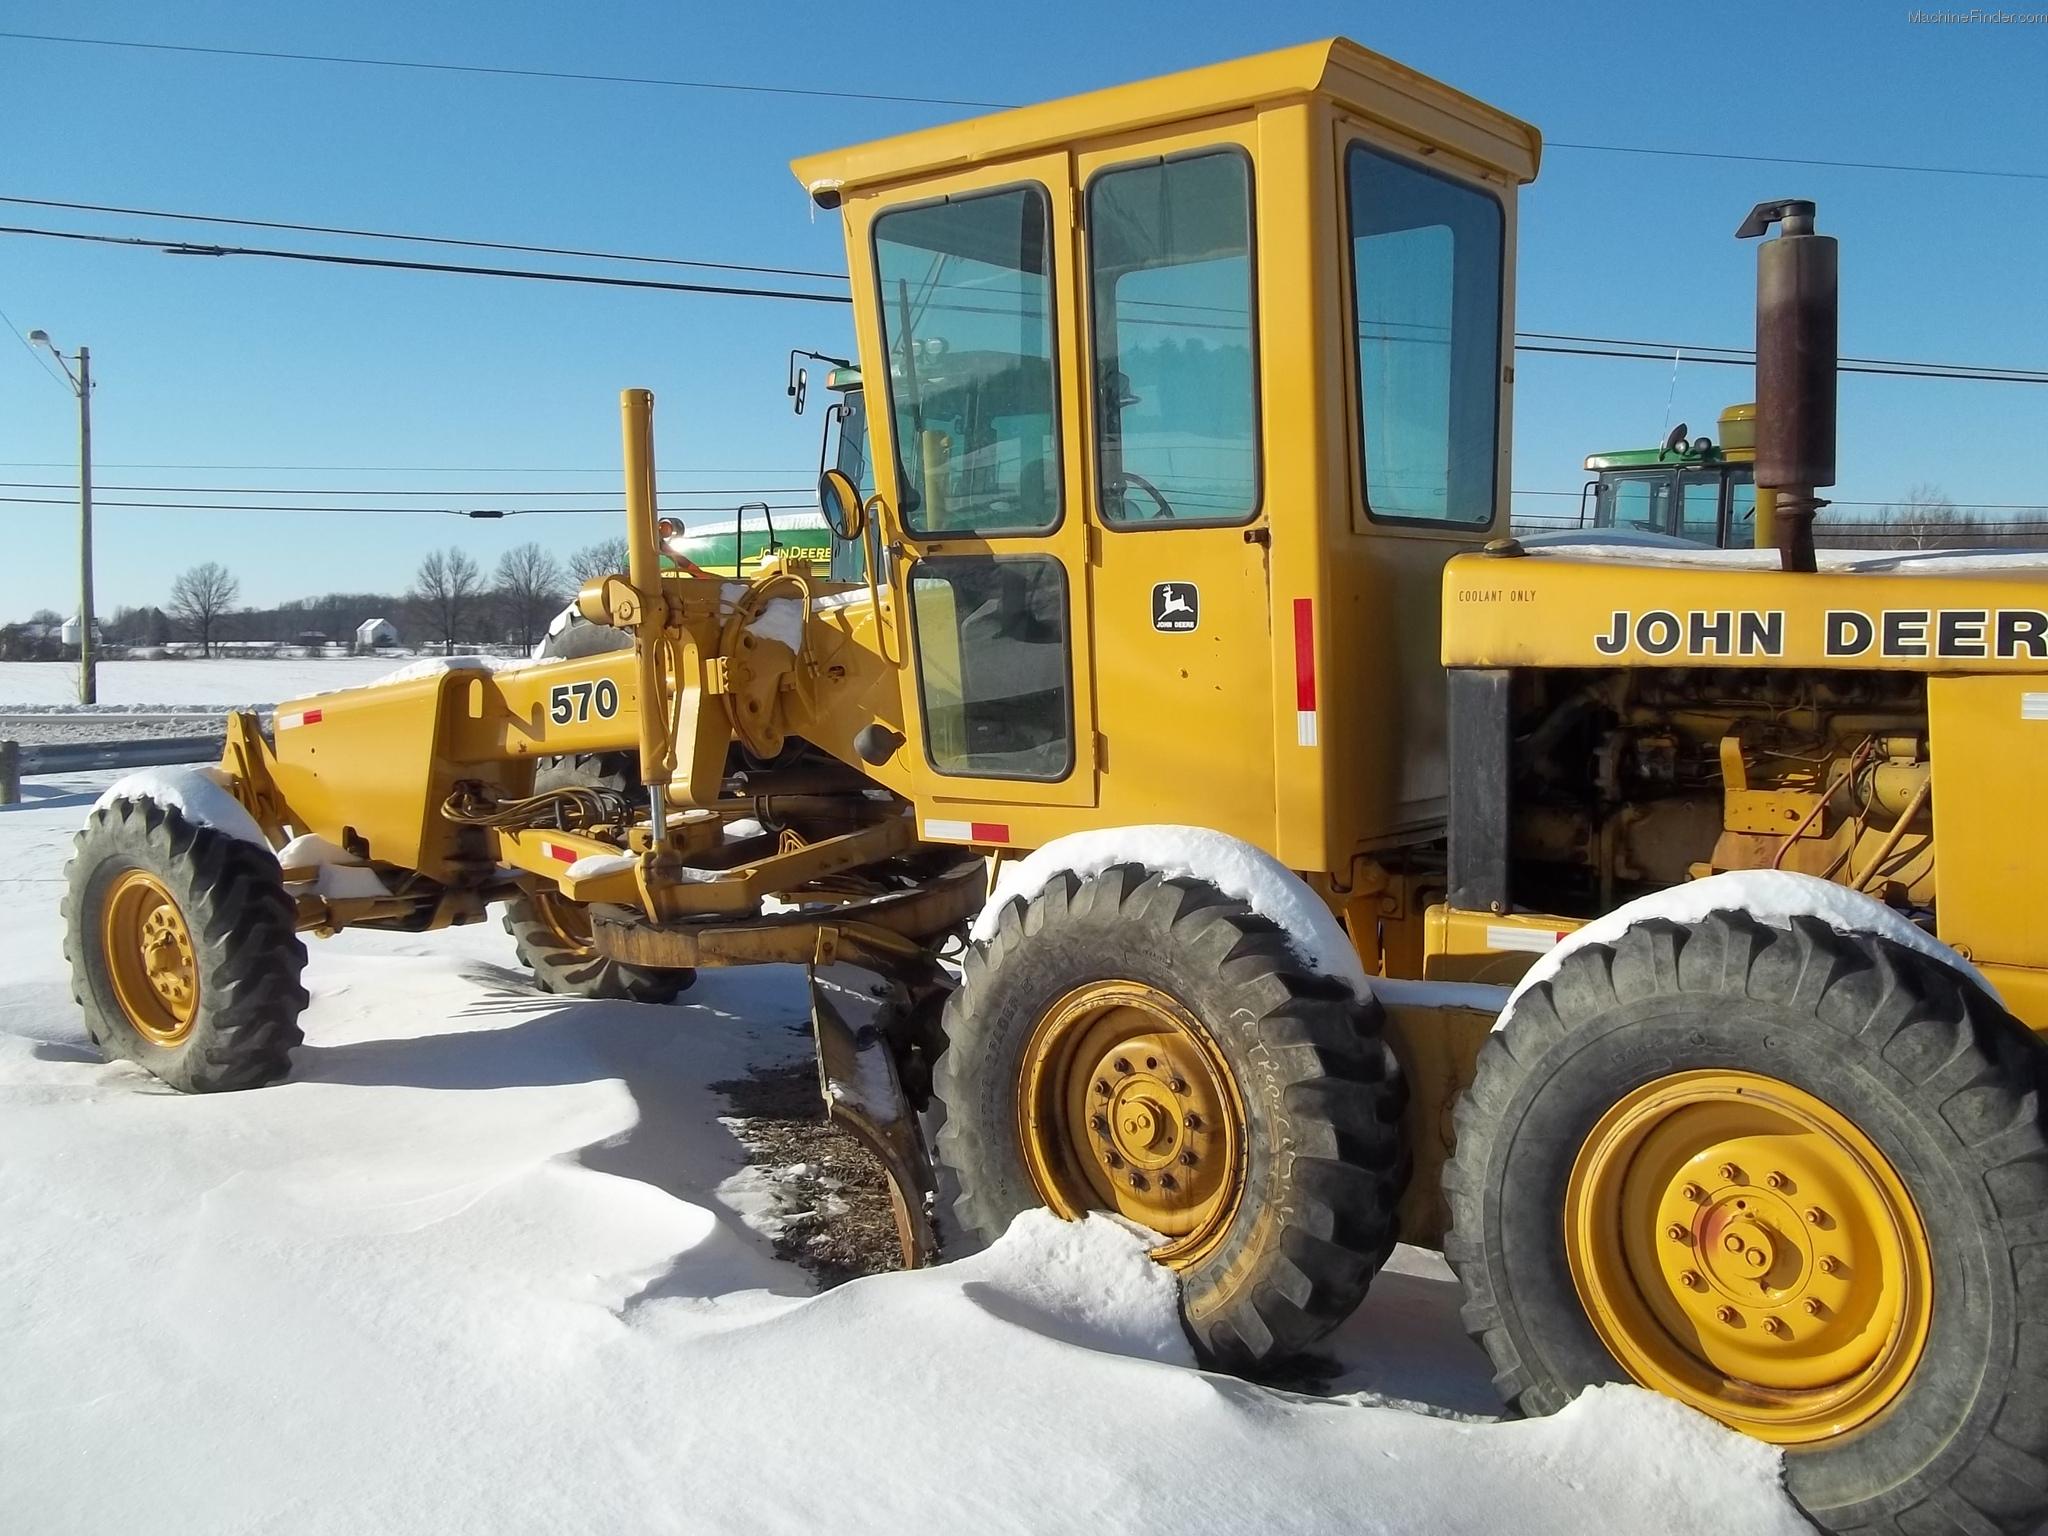 John deere 570 motor grader john deere machinefinder for John deere motor grader parts